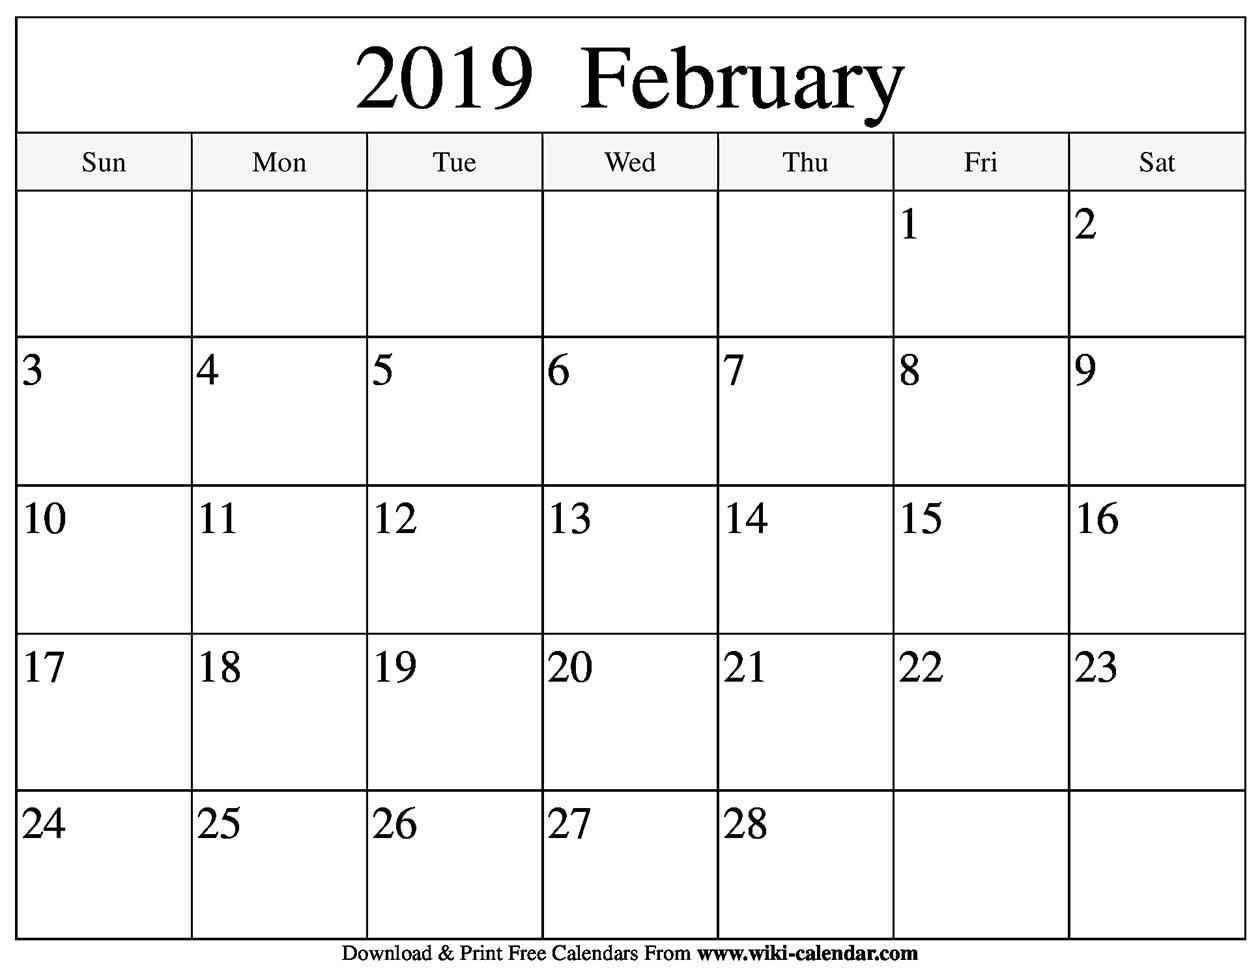 Blank February 2019 Calendar Printable Calendar Feb 8 2019